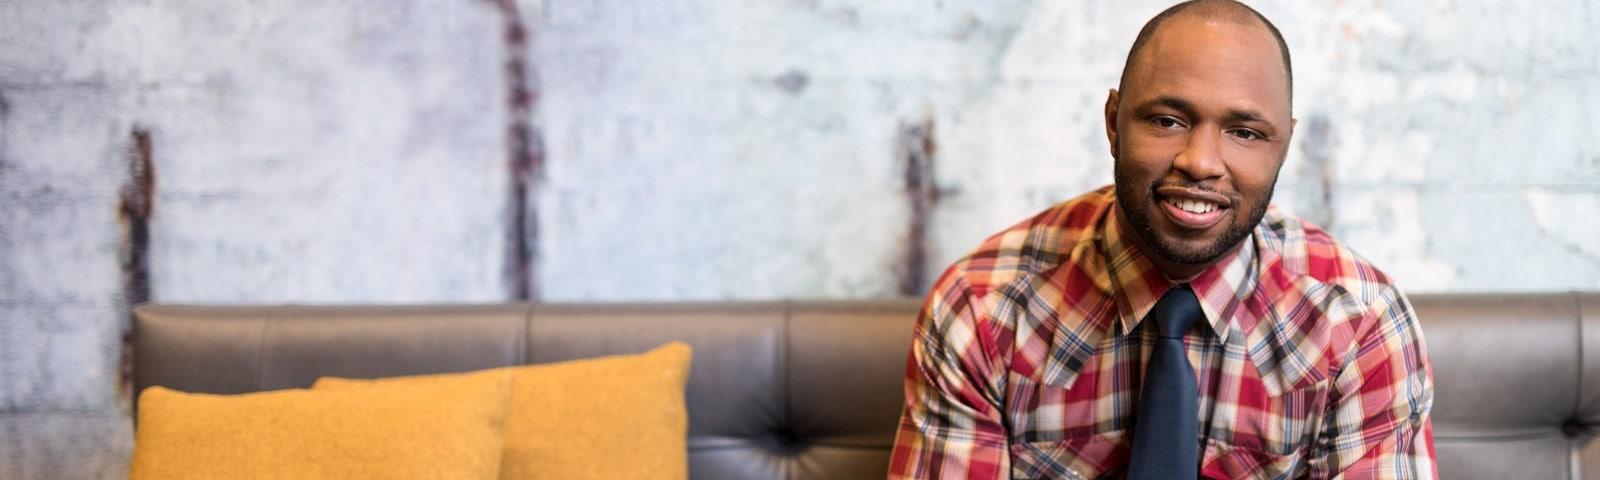 Smiling man in plaid shirt